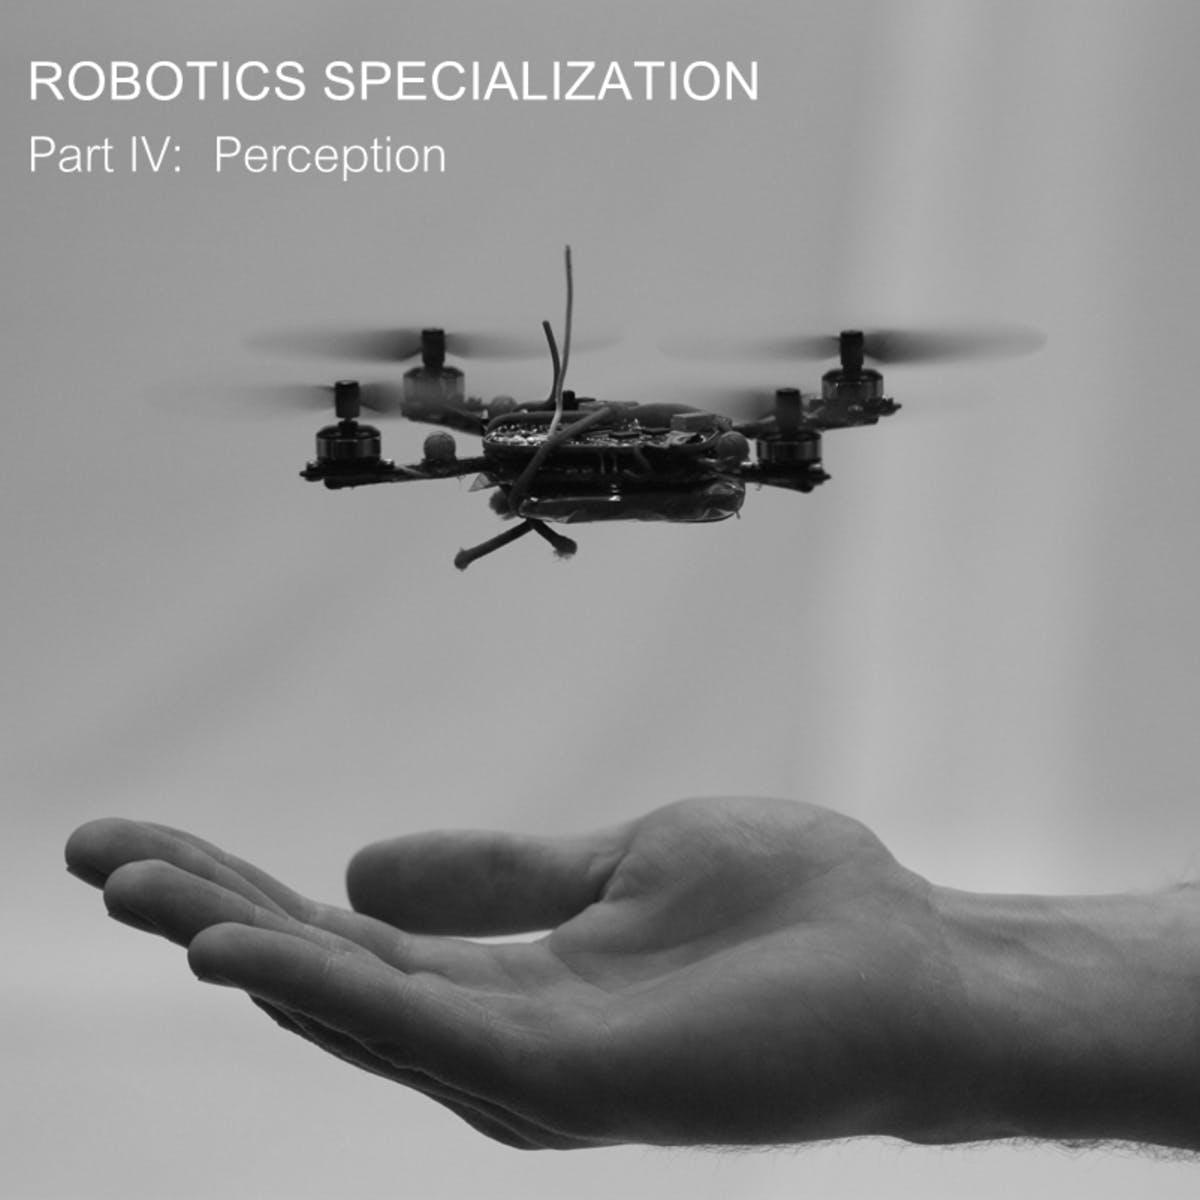 Robotics Perception Coursera